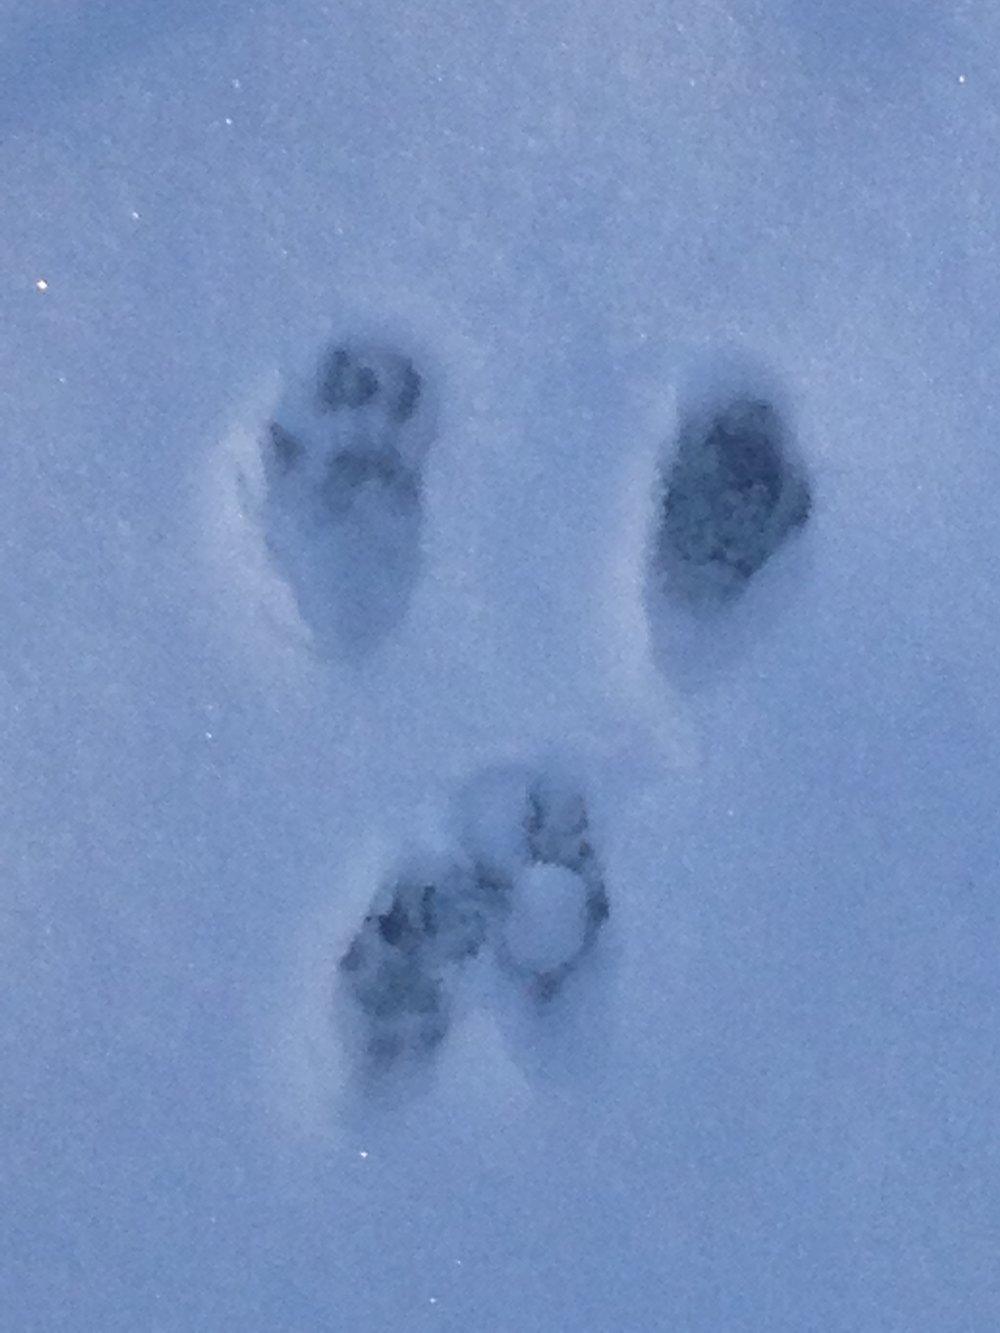 Yestonature-snowprints.jpg